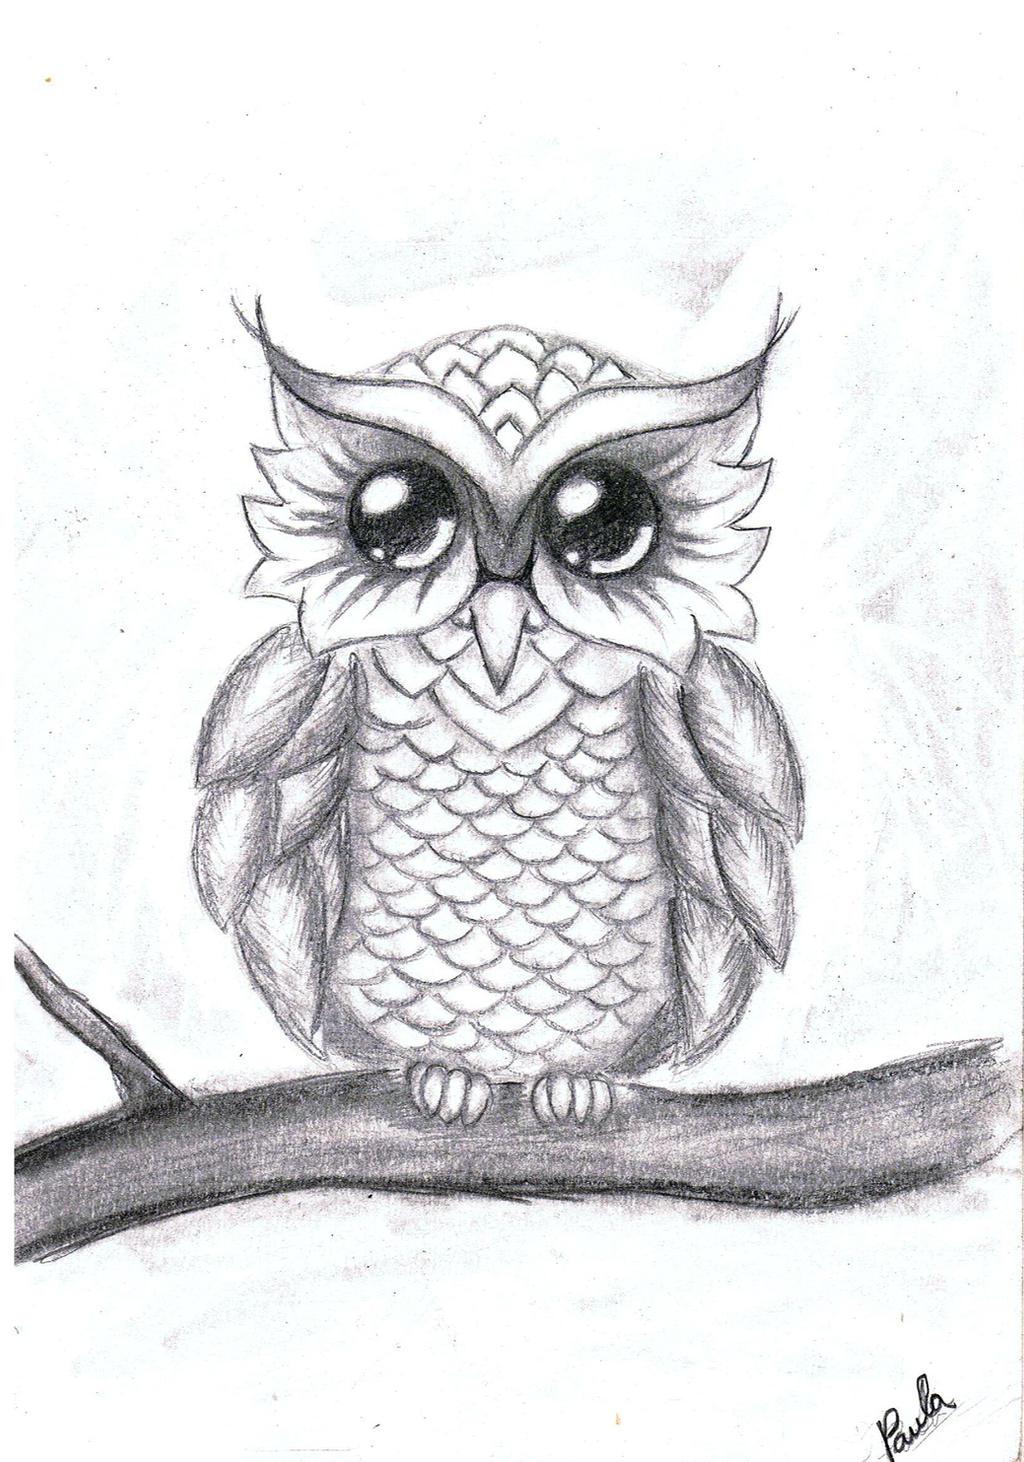 My little owl by paula leimane on deviantart for Small art drawings